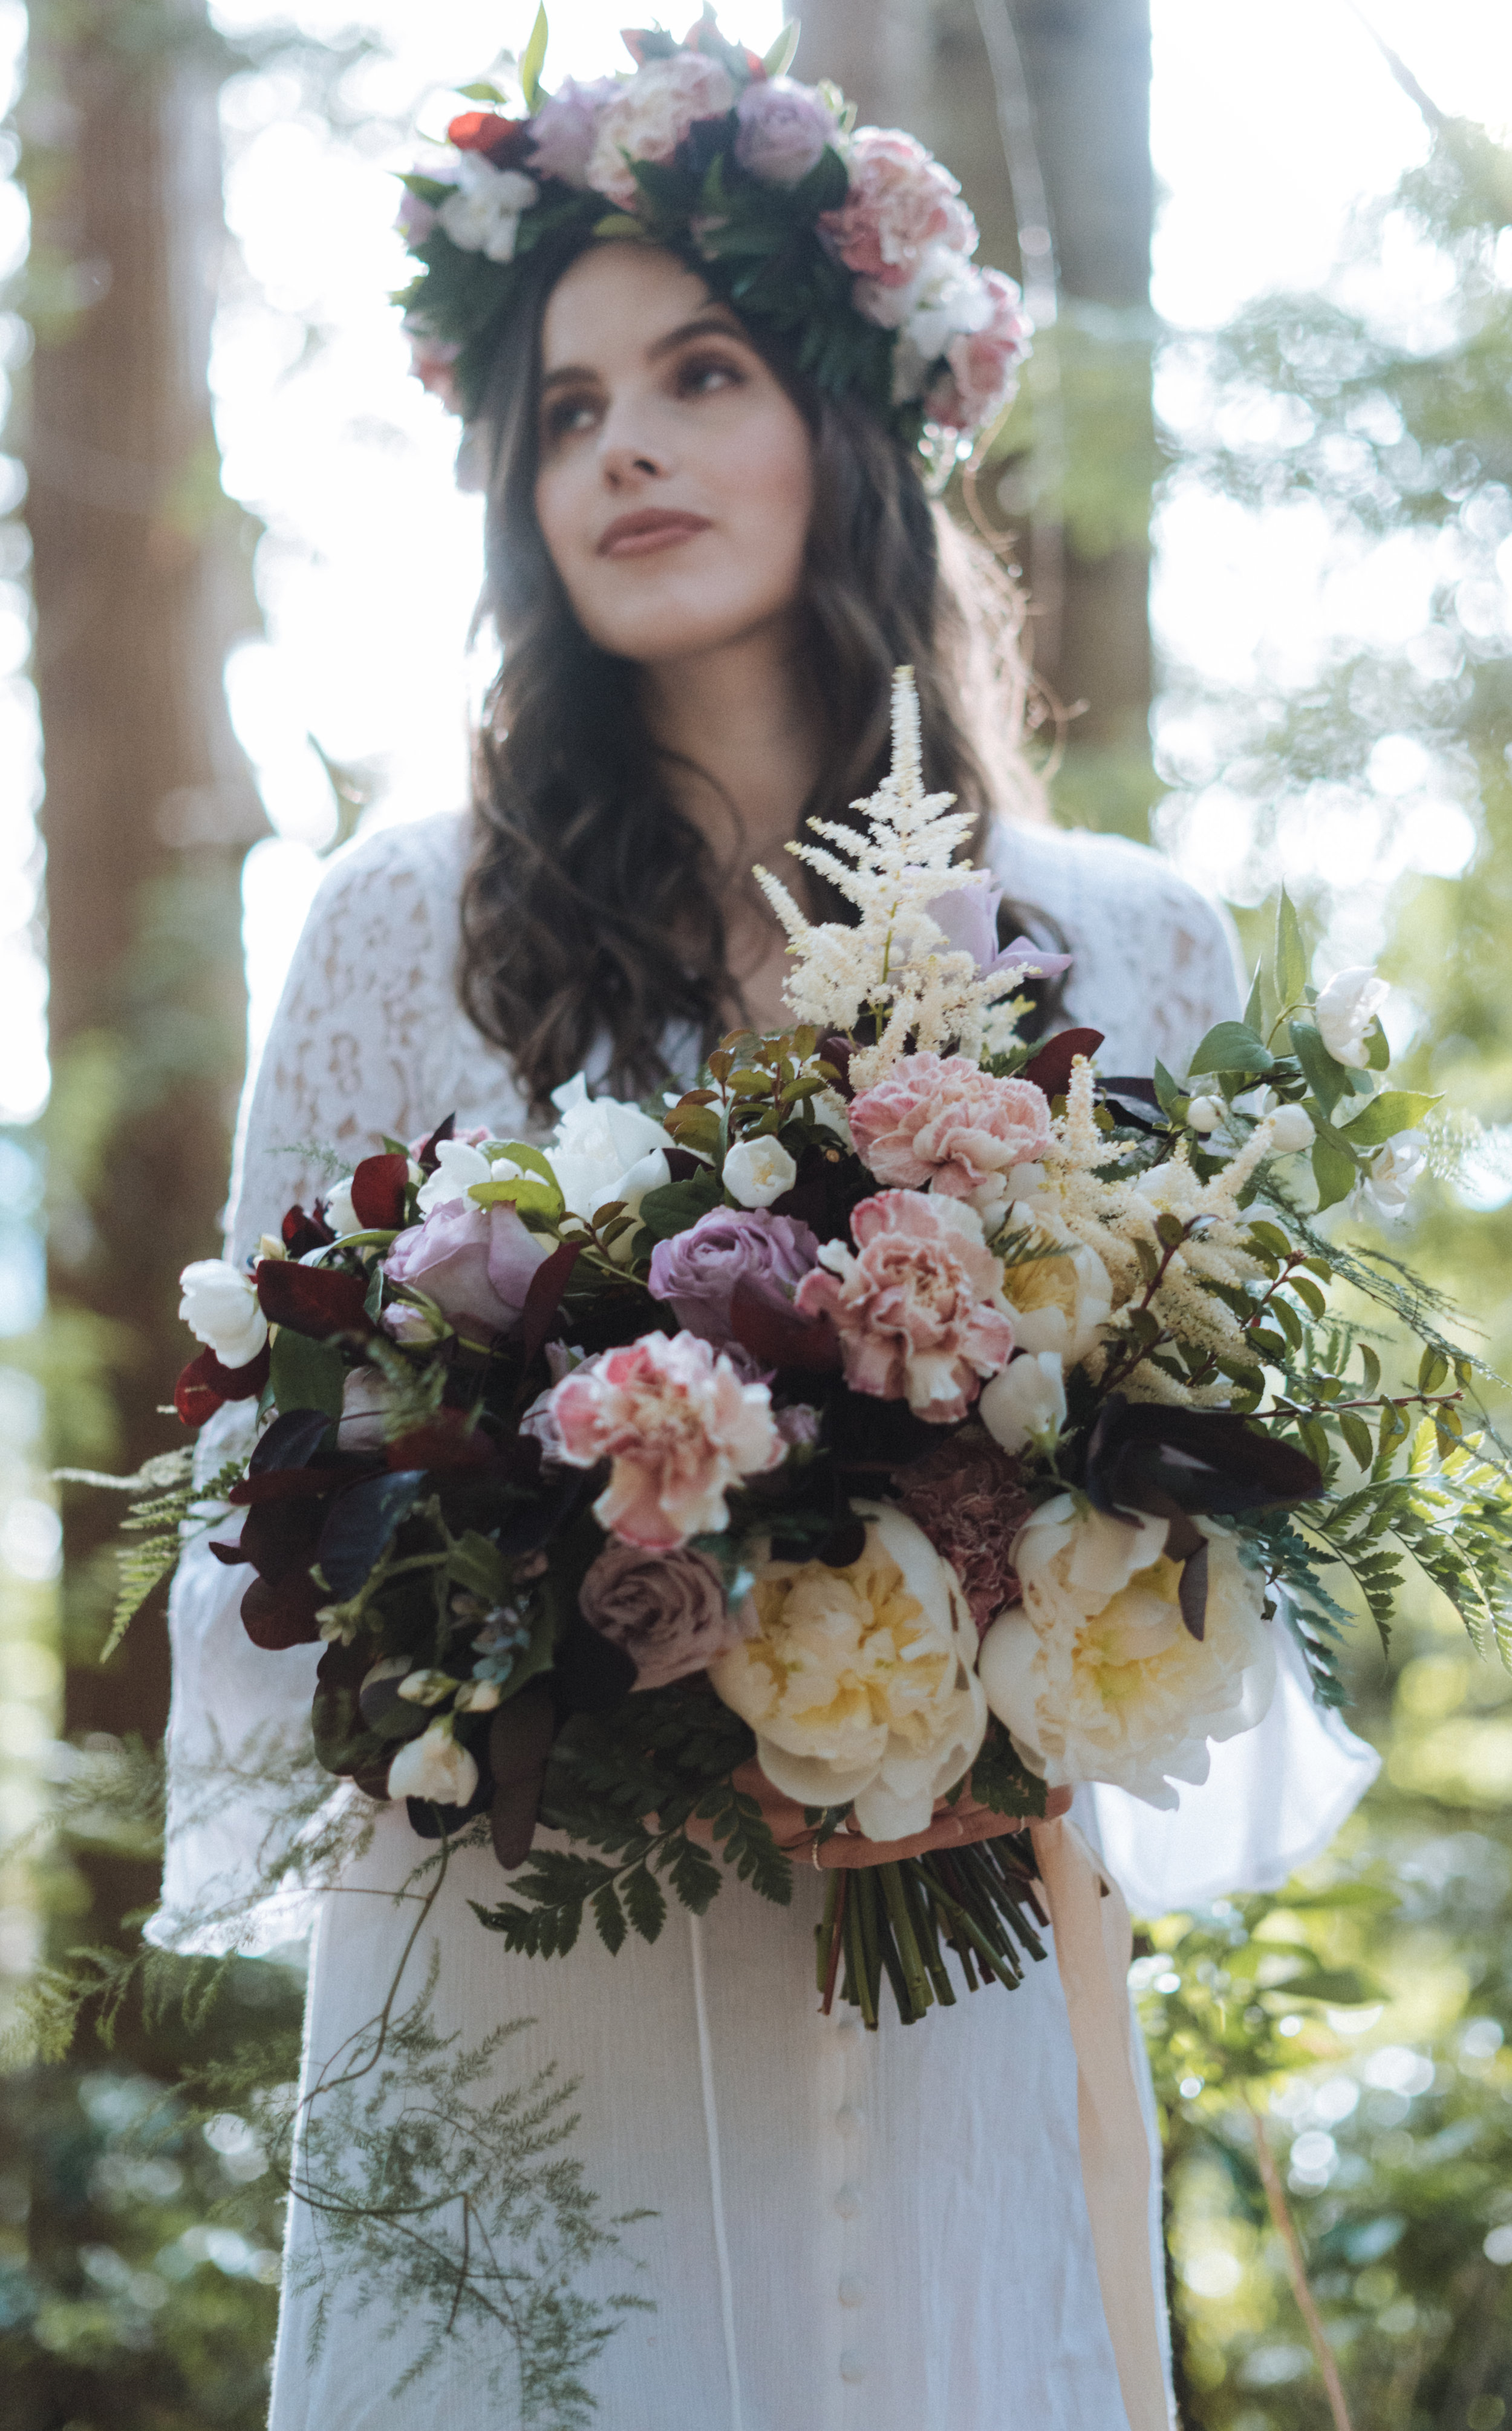 Vancouver-Canada-Travel-Elopement-Adventure-Wedding-Portrait-Photographer-Emma-Rae8.jpg